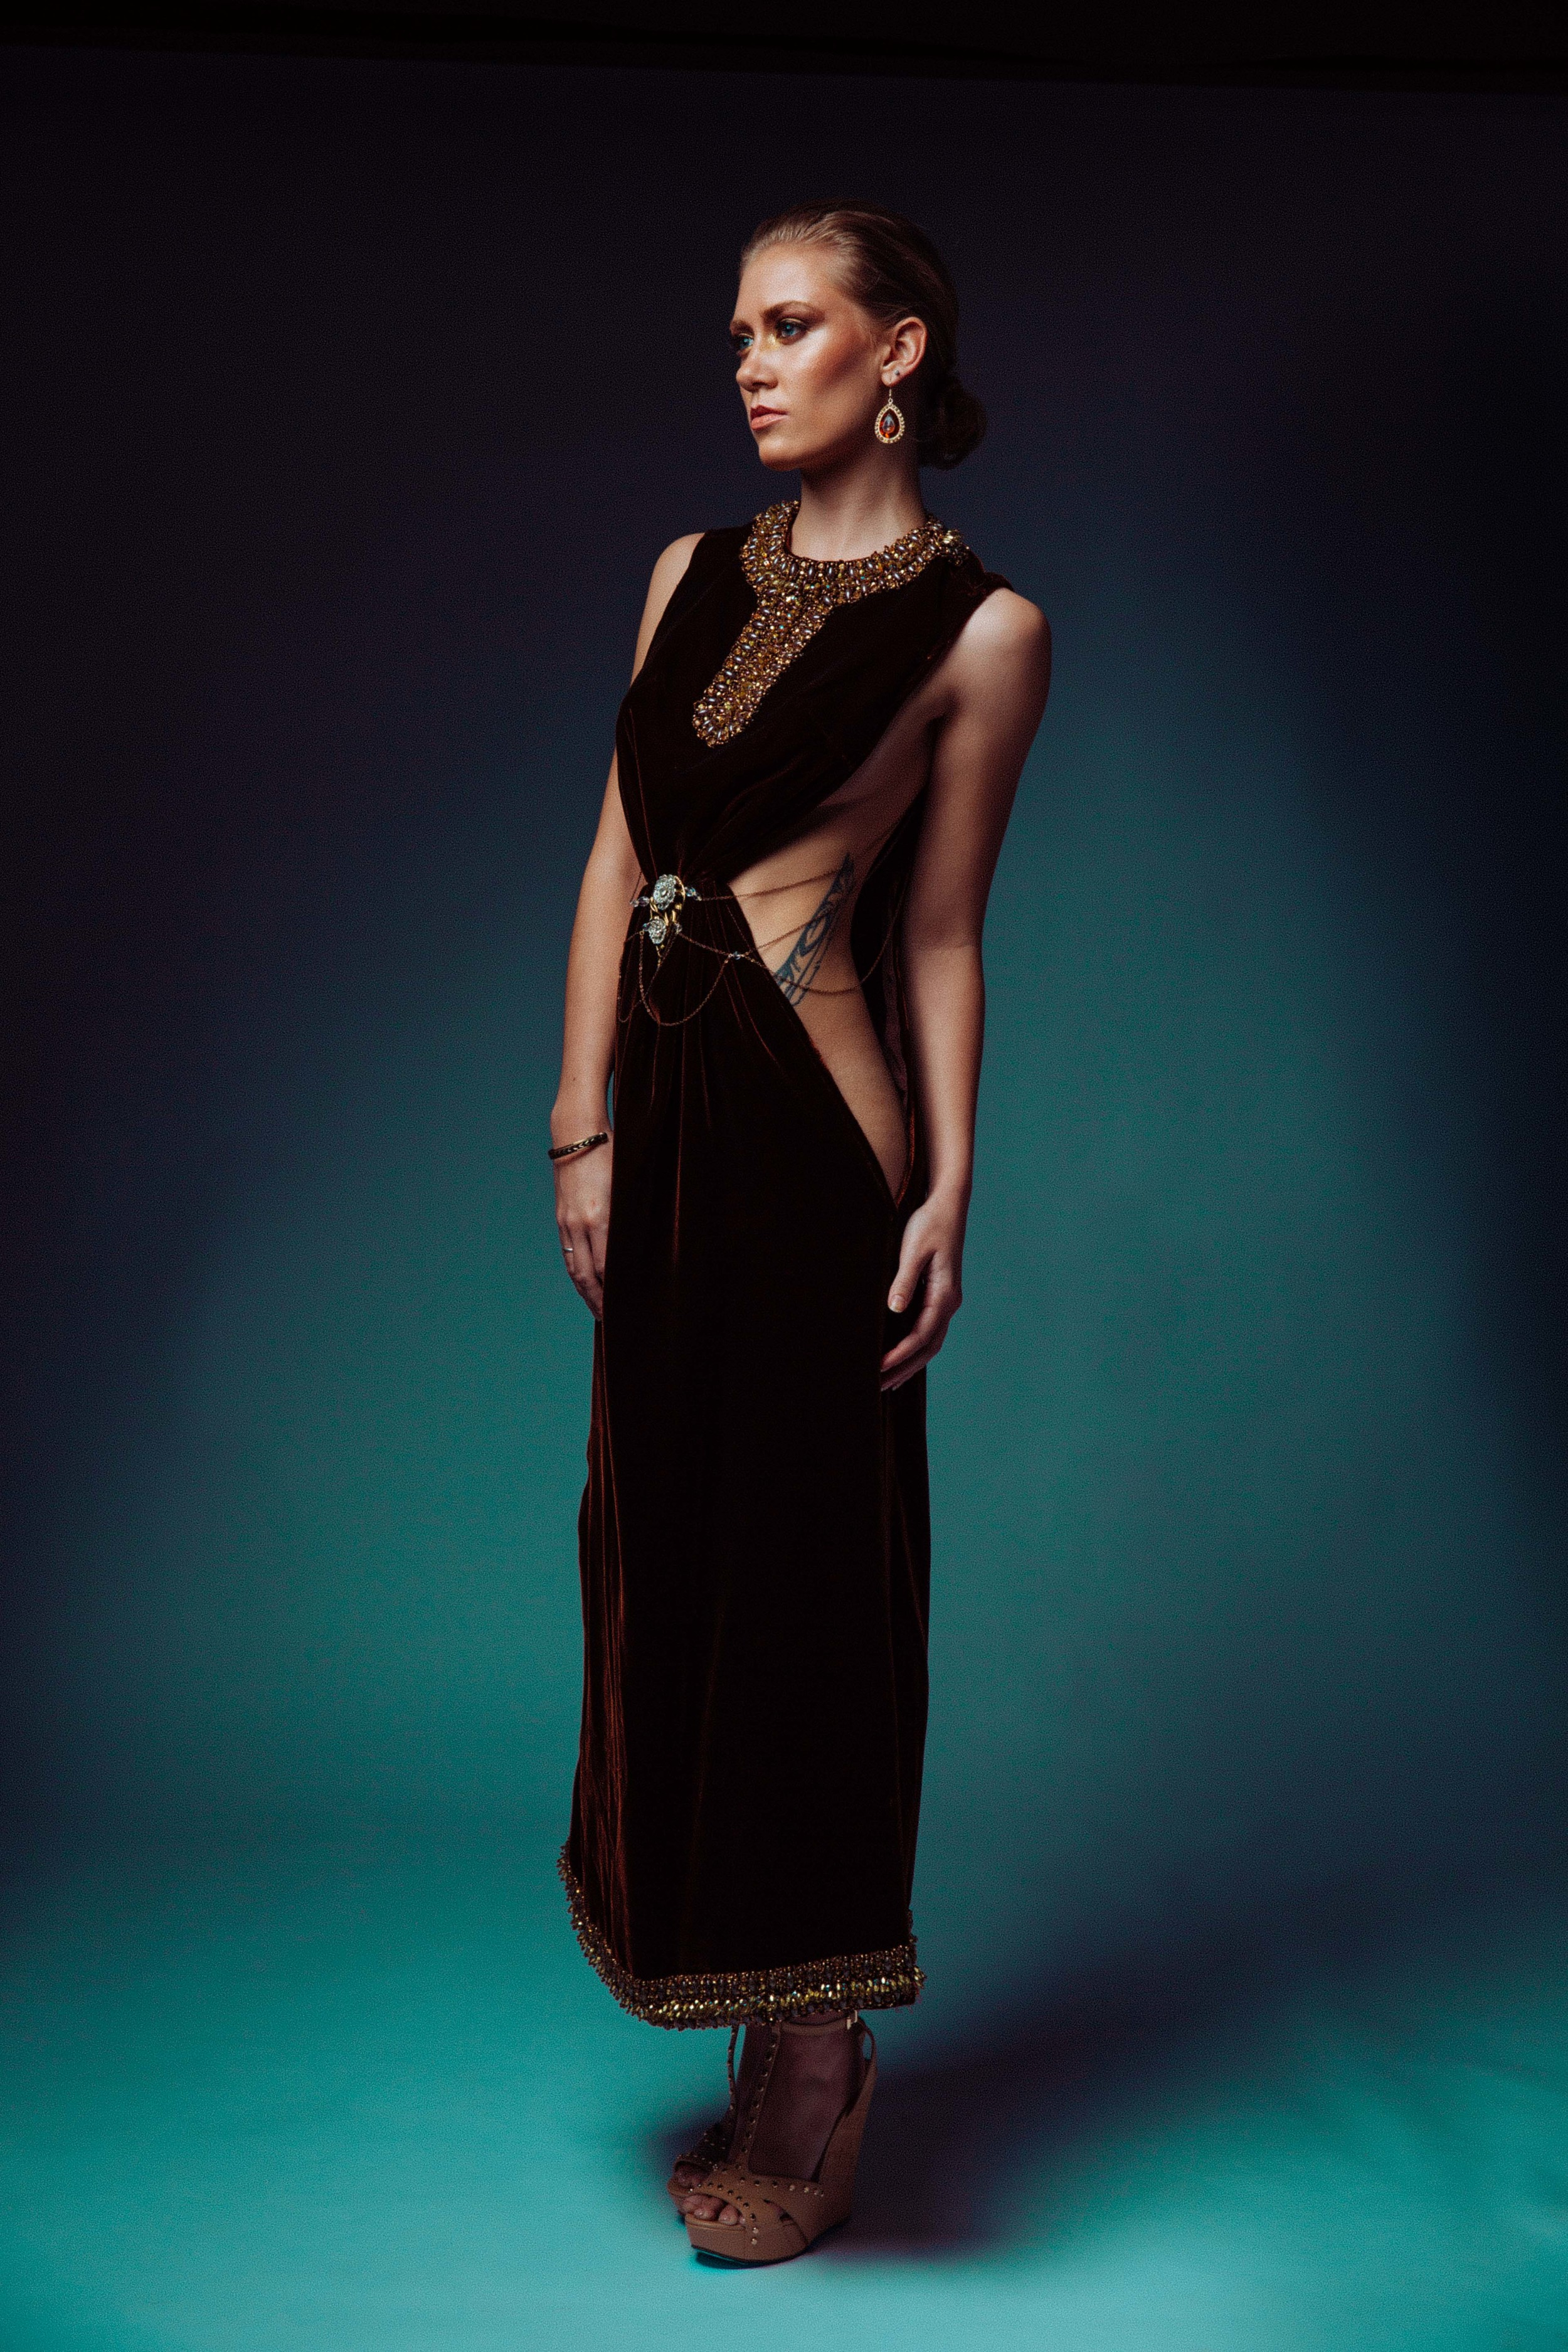 KImflink_couture-726_NOLOGO.jpg